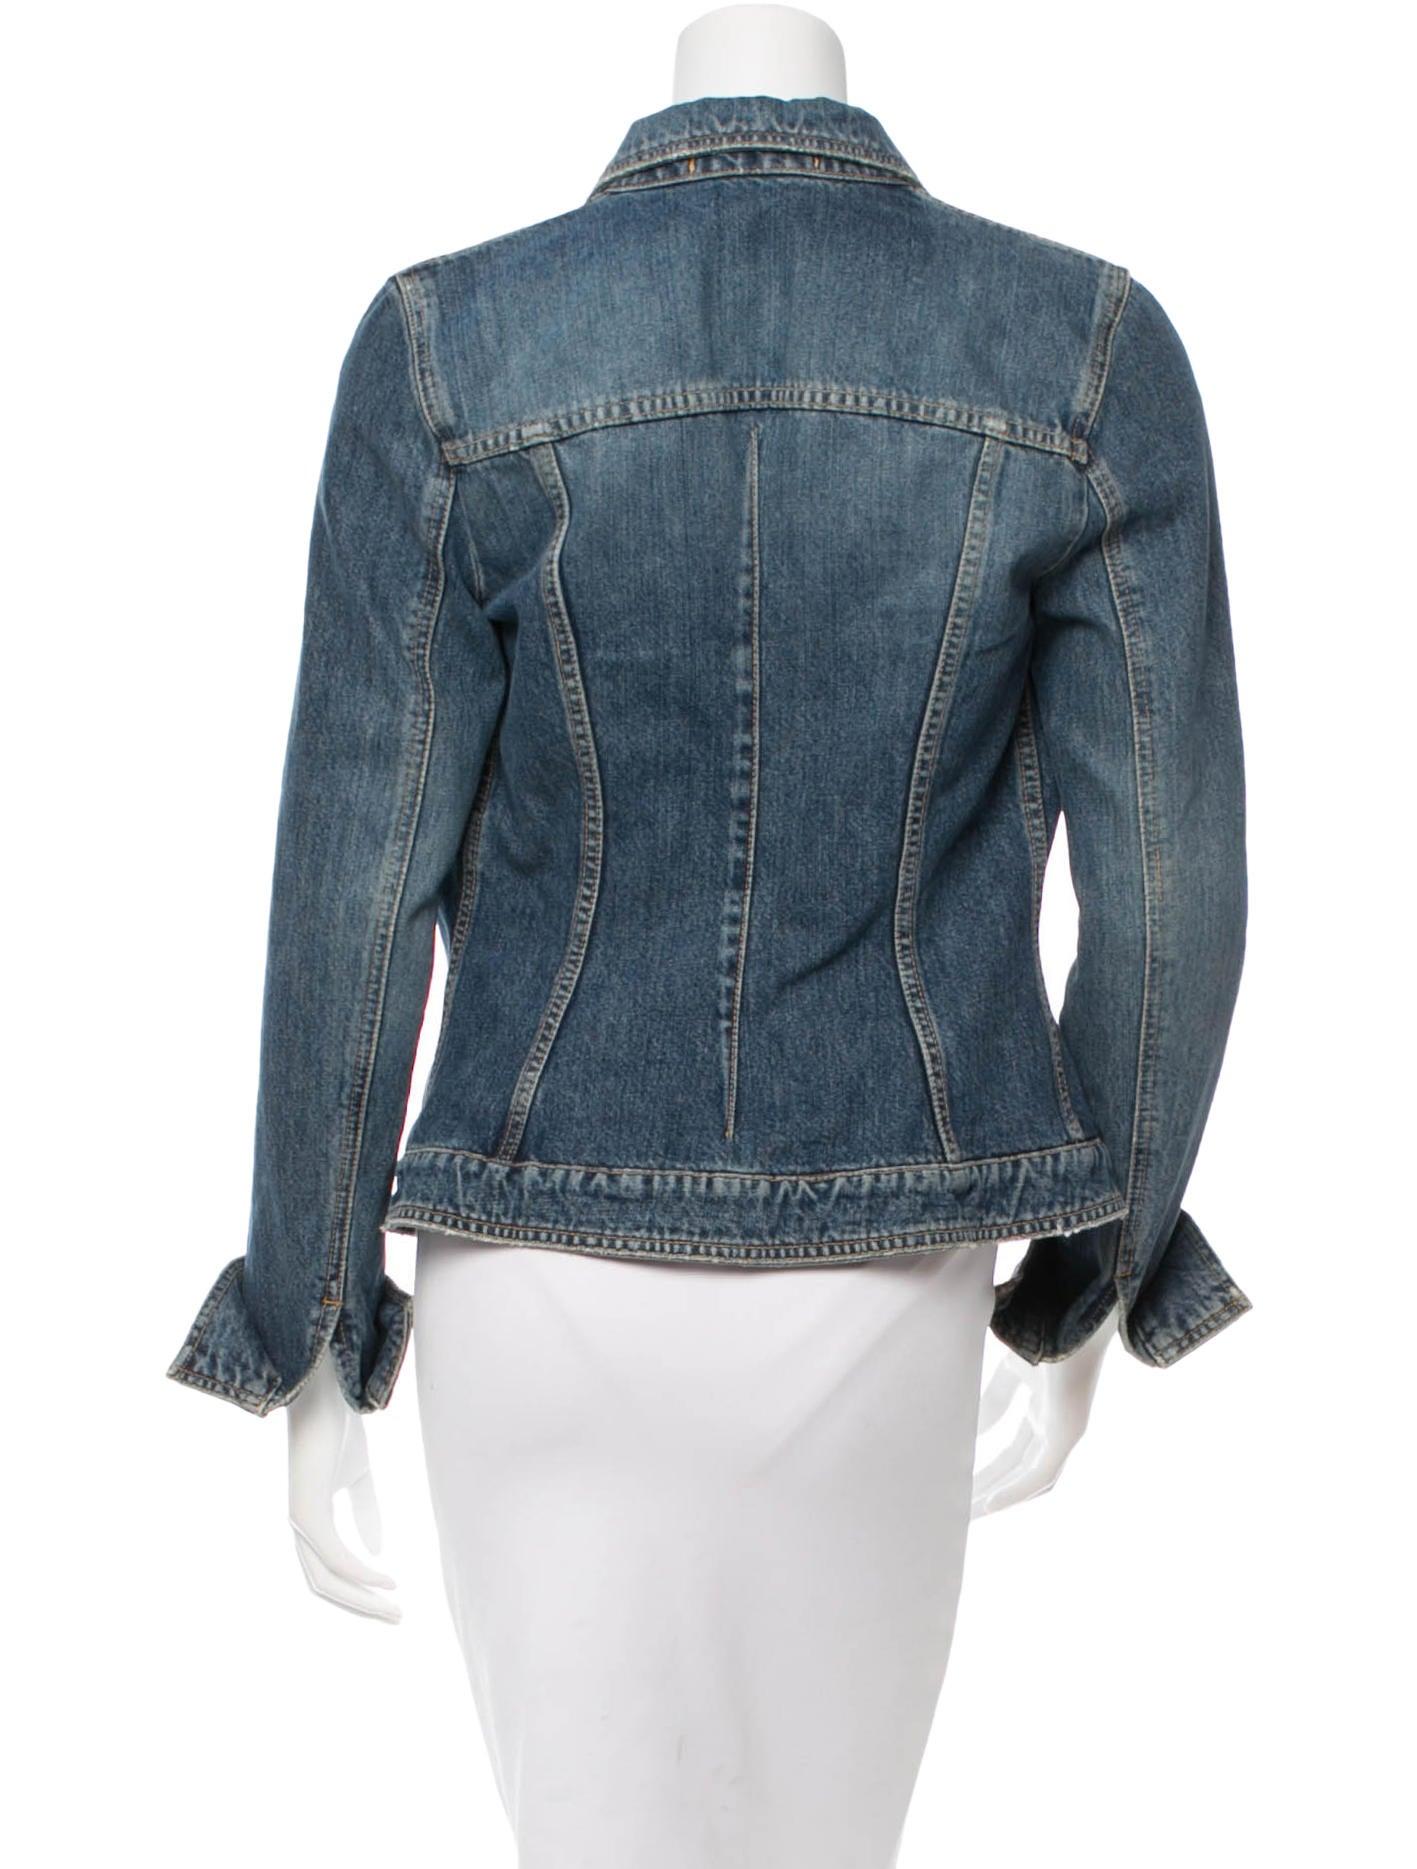 Dolce Amp Gabbana Distressed Denim Jacket Clothing